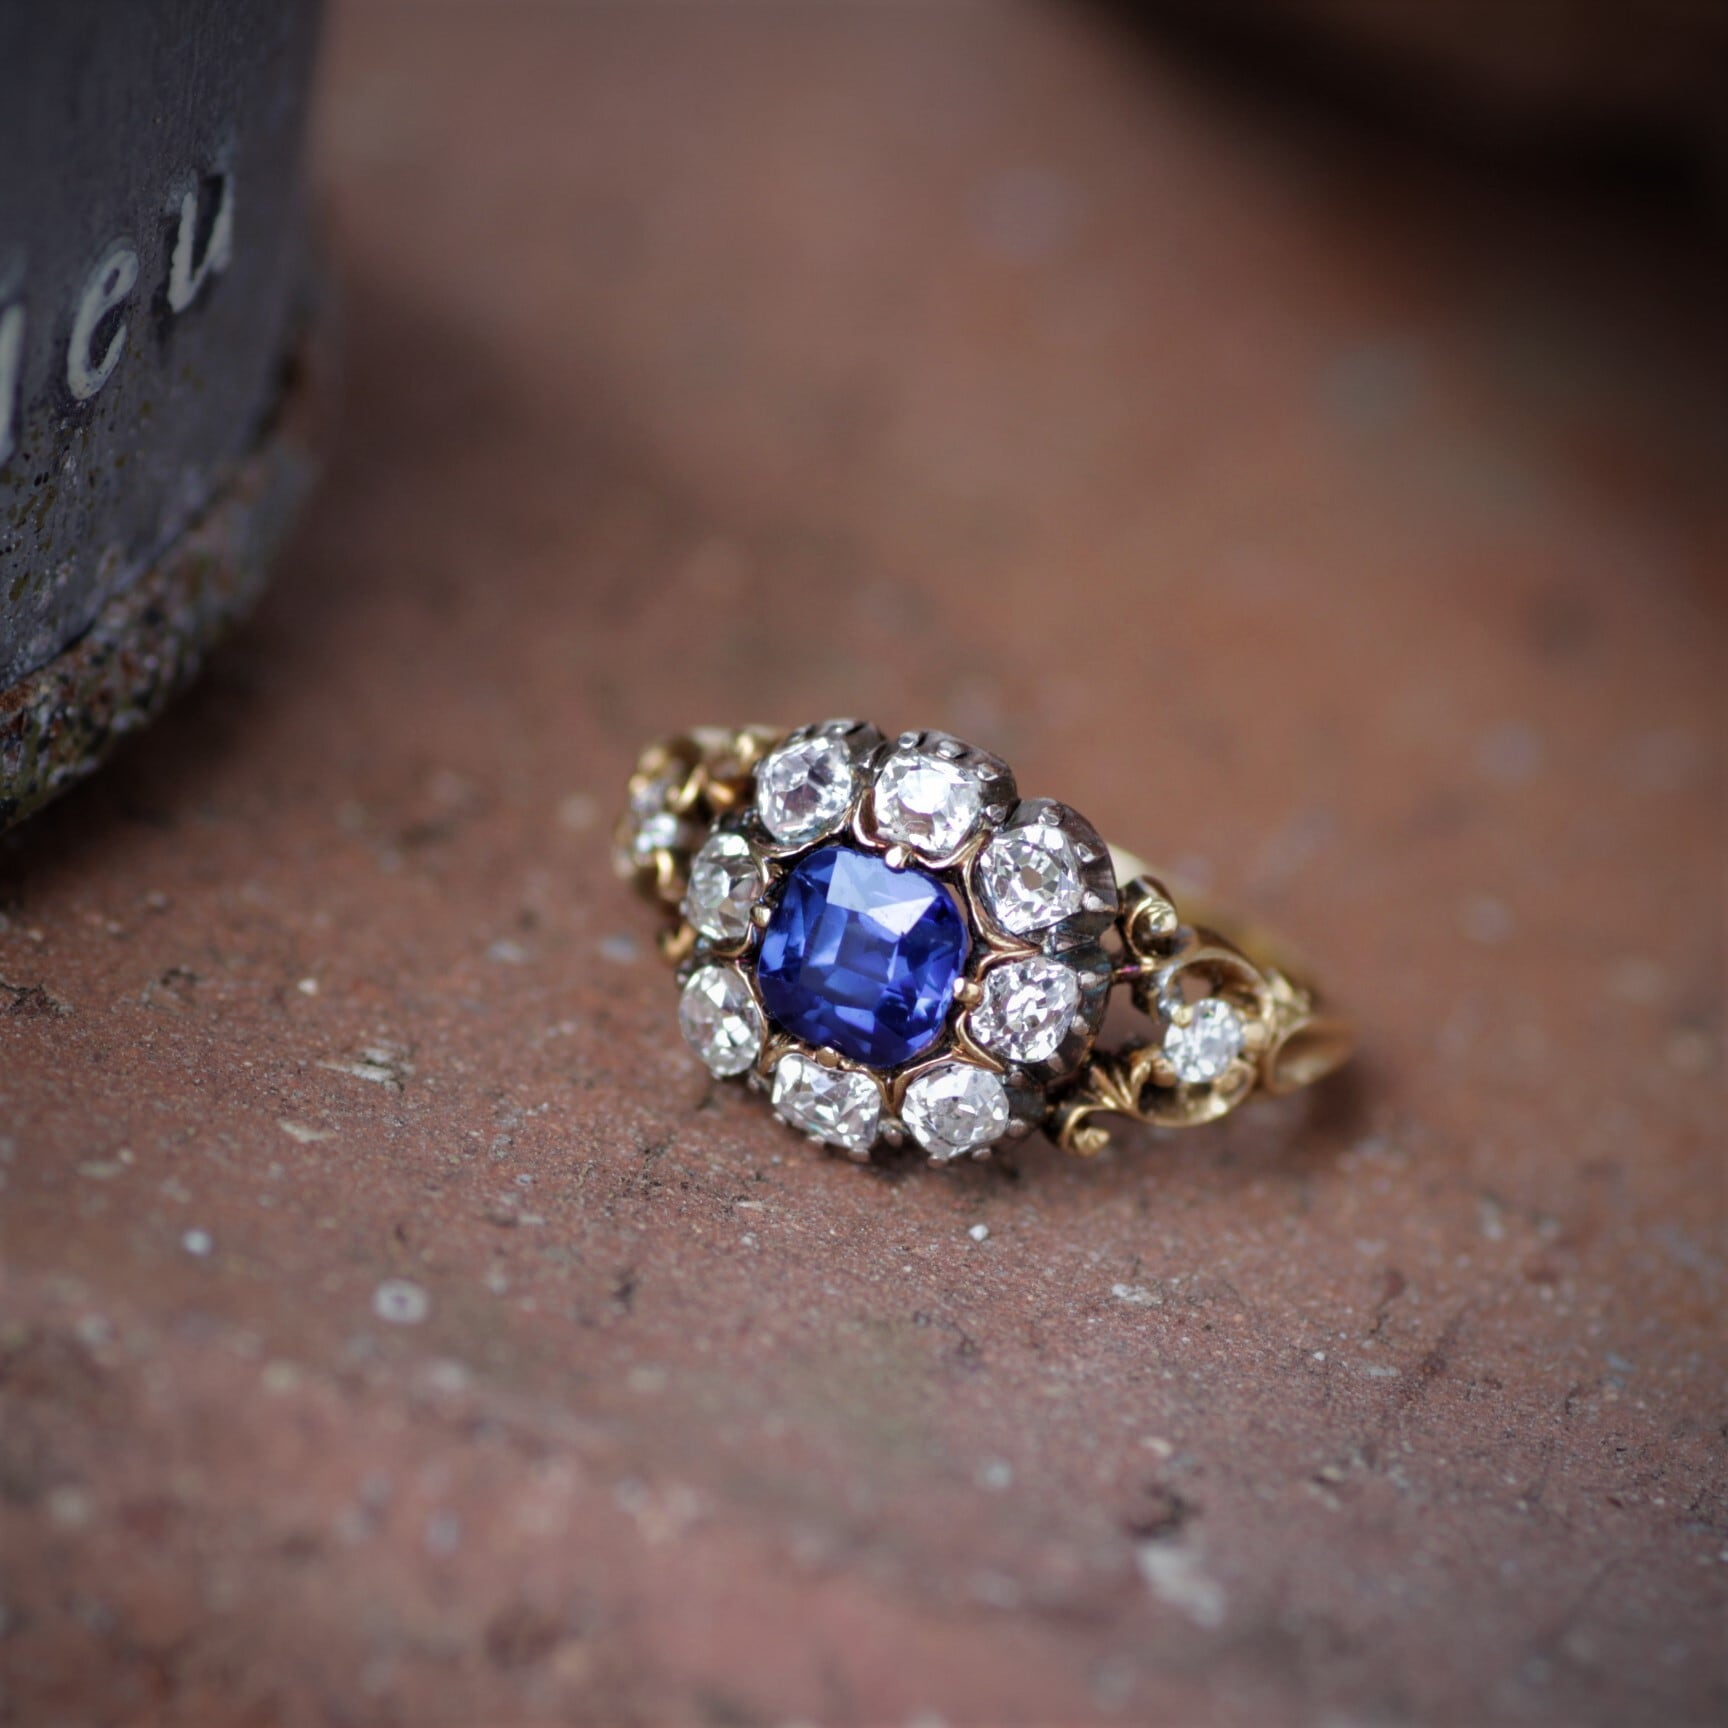 Late Georgian Sapphire & Diamond Ring ジョージアン サファイヤ&ダイヤモンド リング